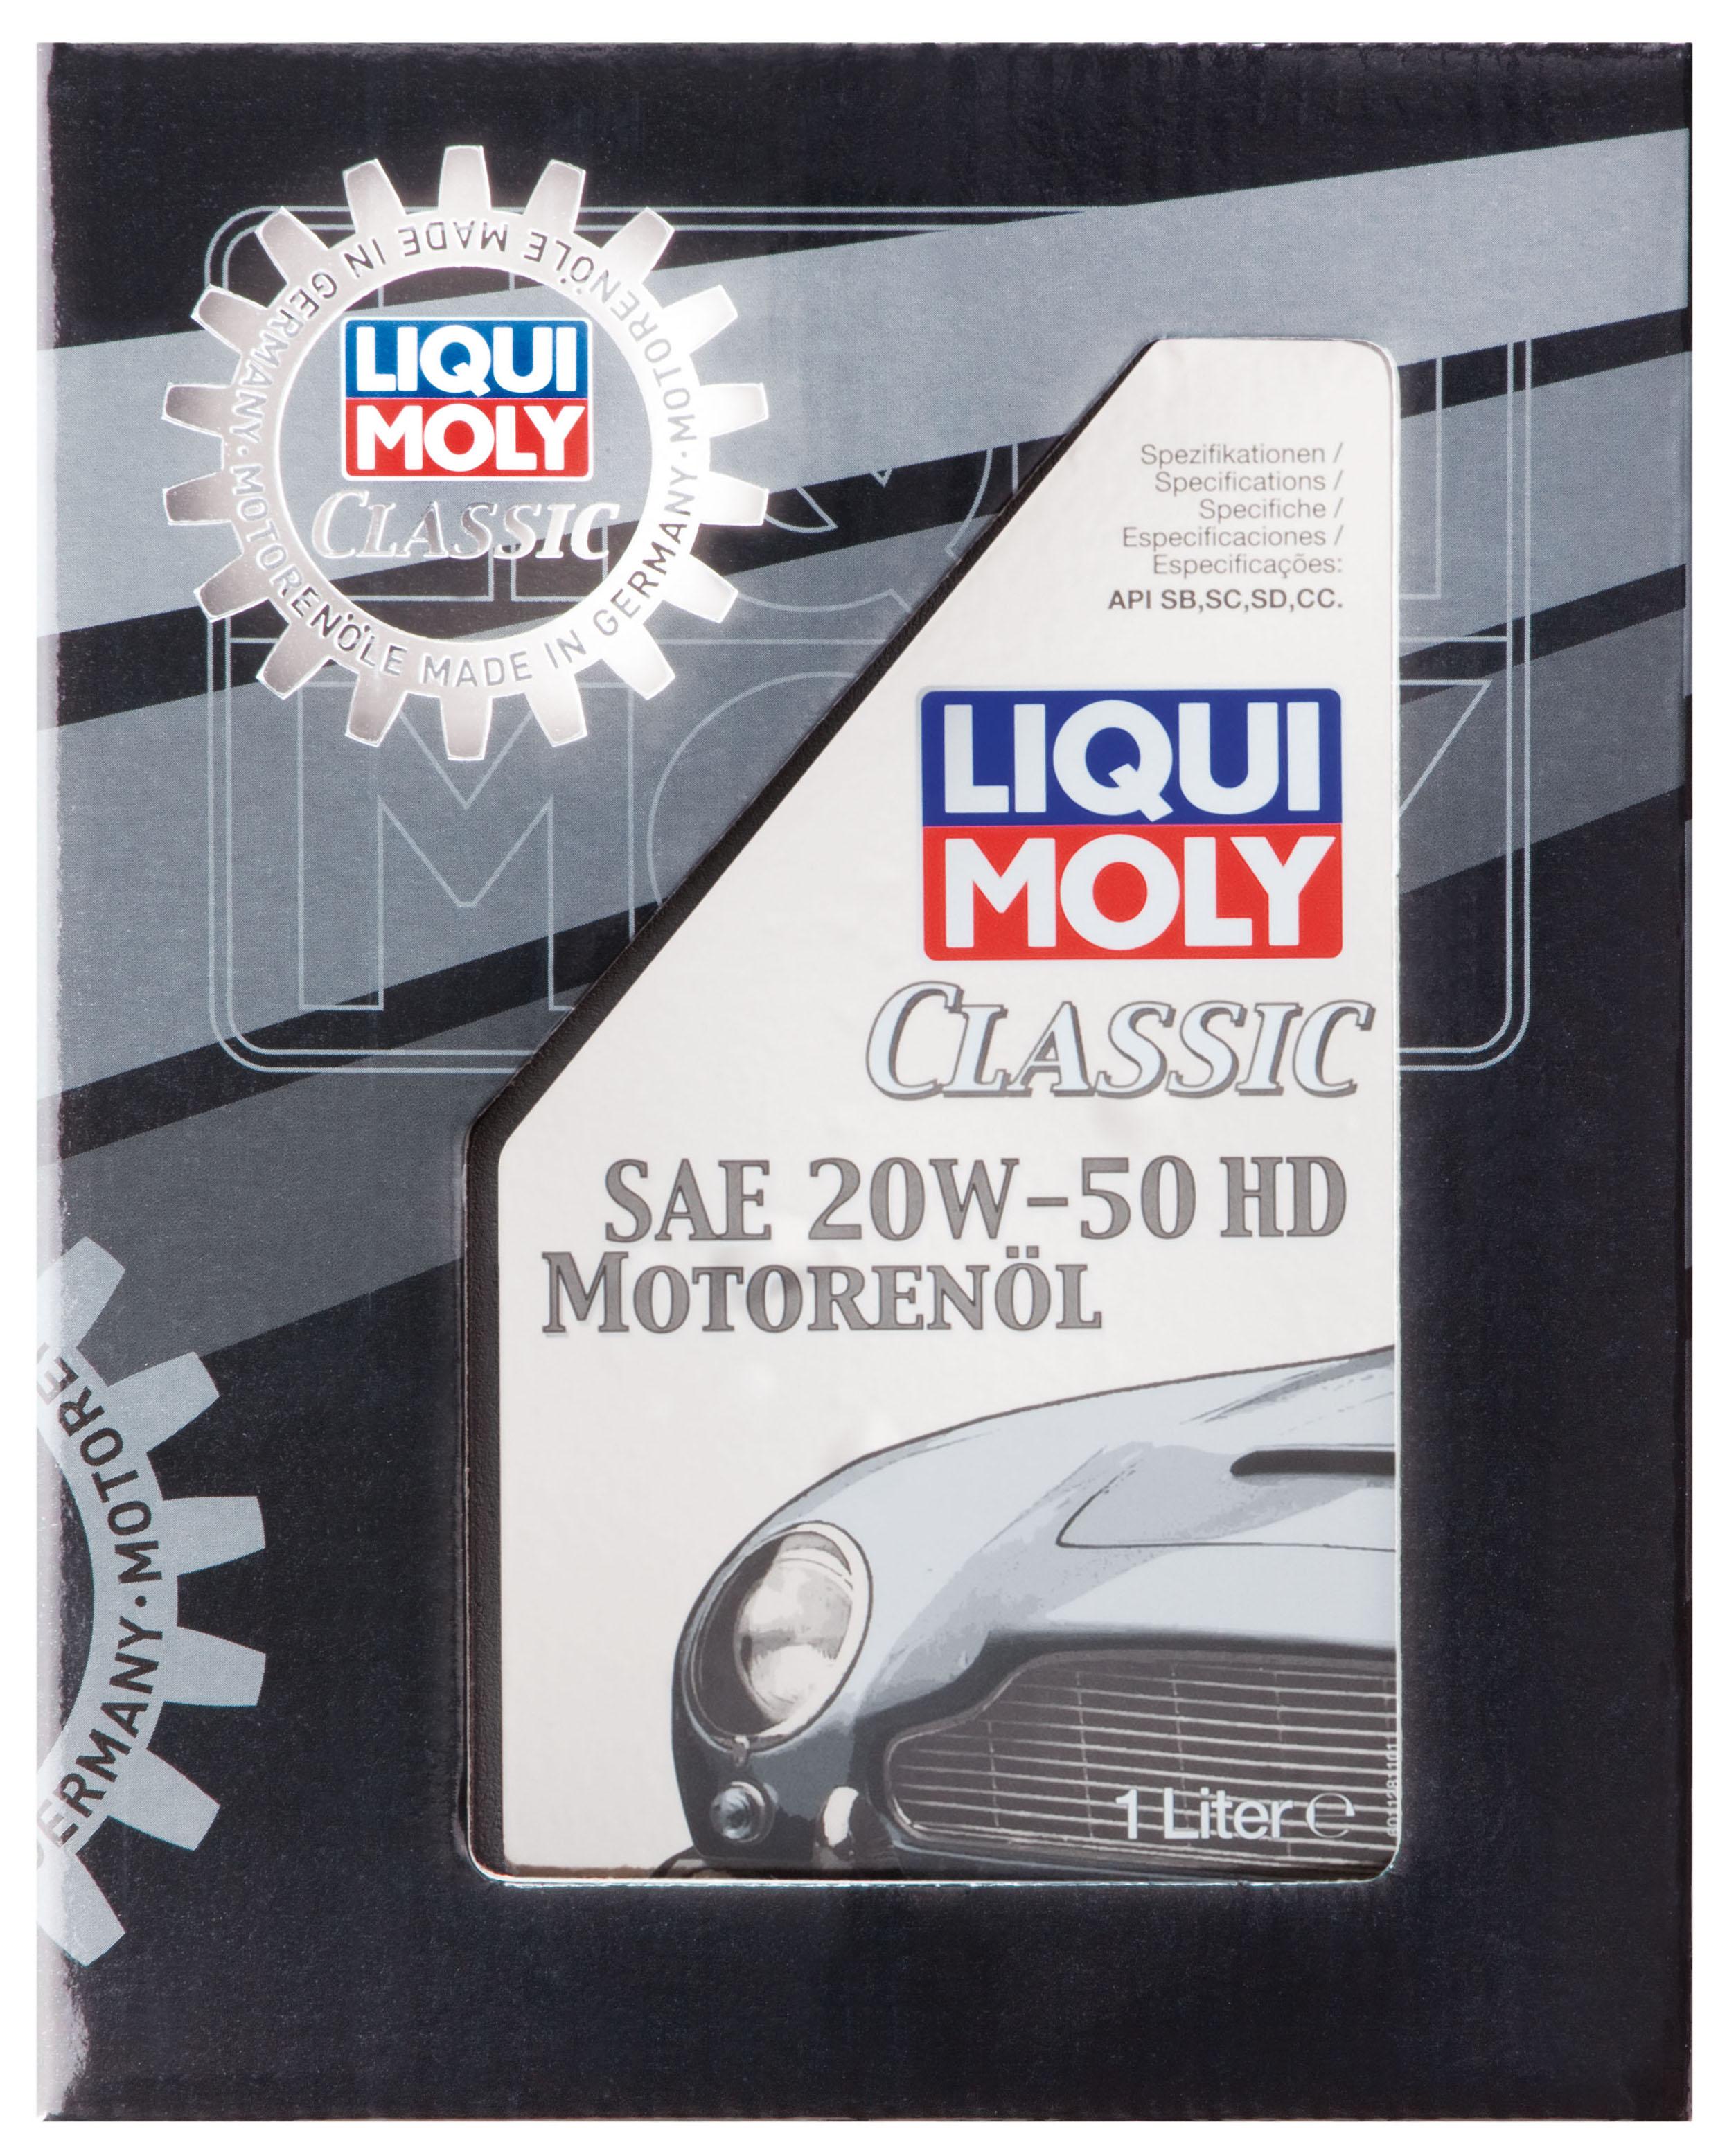 liqui moly 1128 classic motoren l sae 20w 50 hd ab baujahr. Black Bedroom Furniture Sets. Home Design Ideas